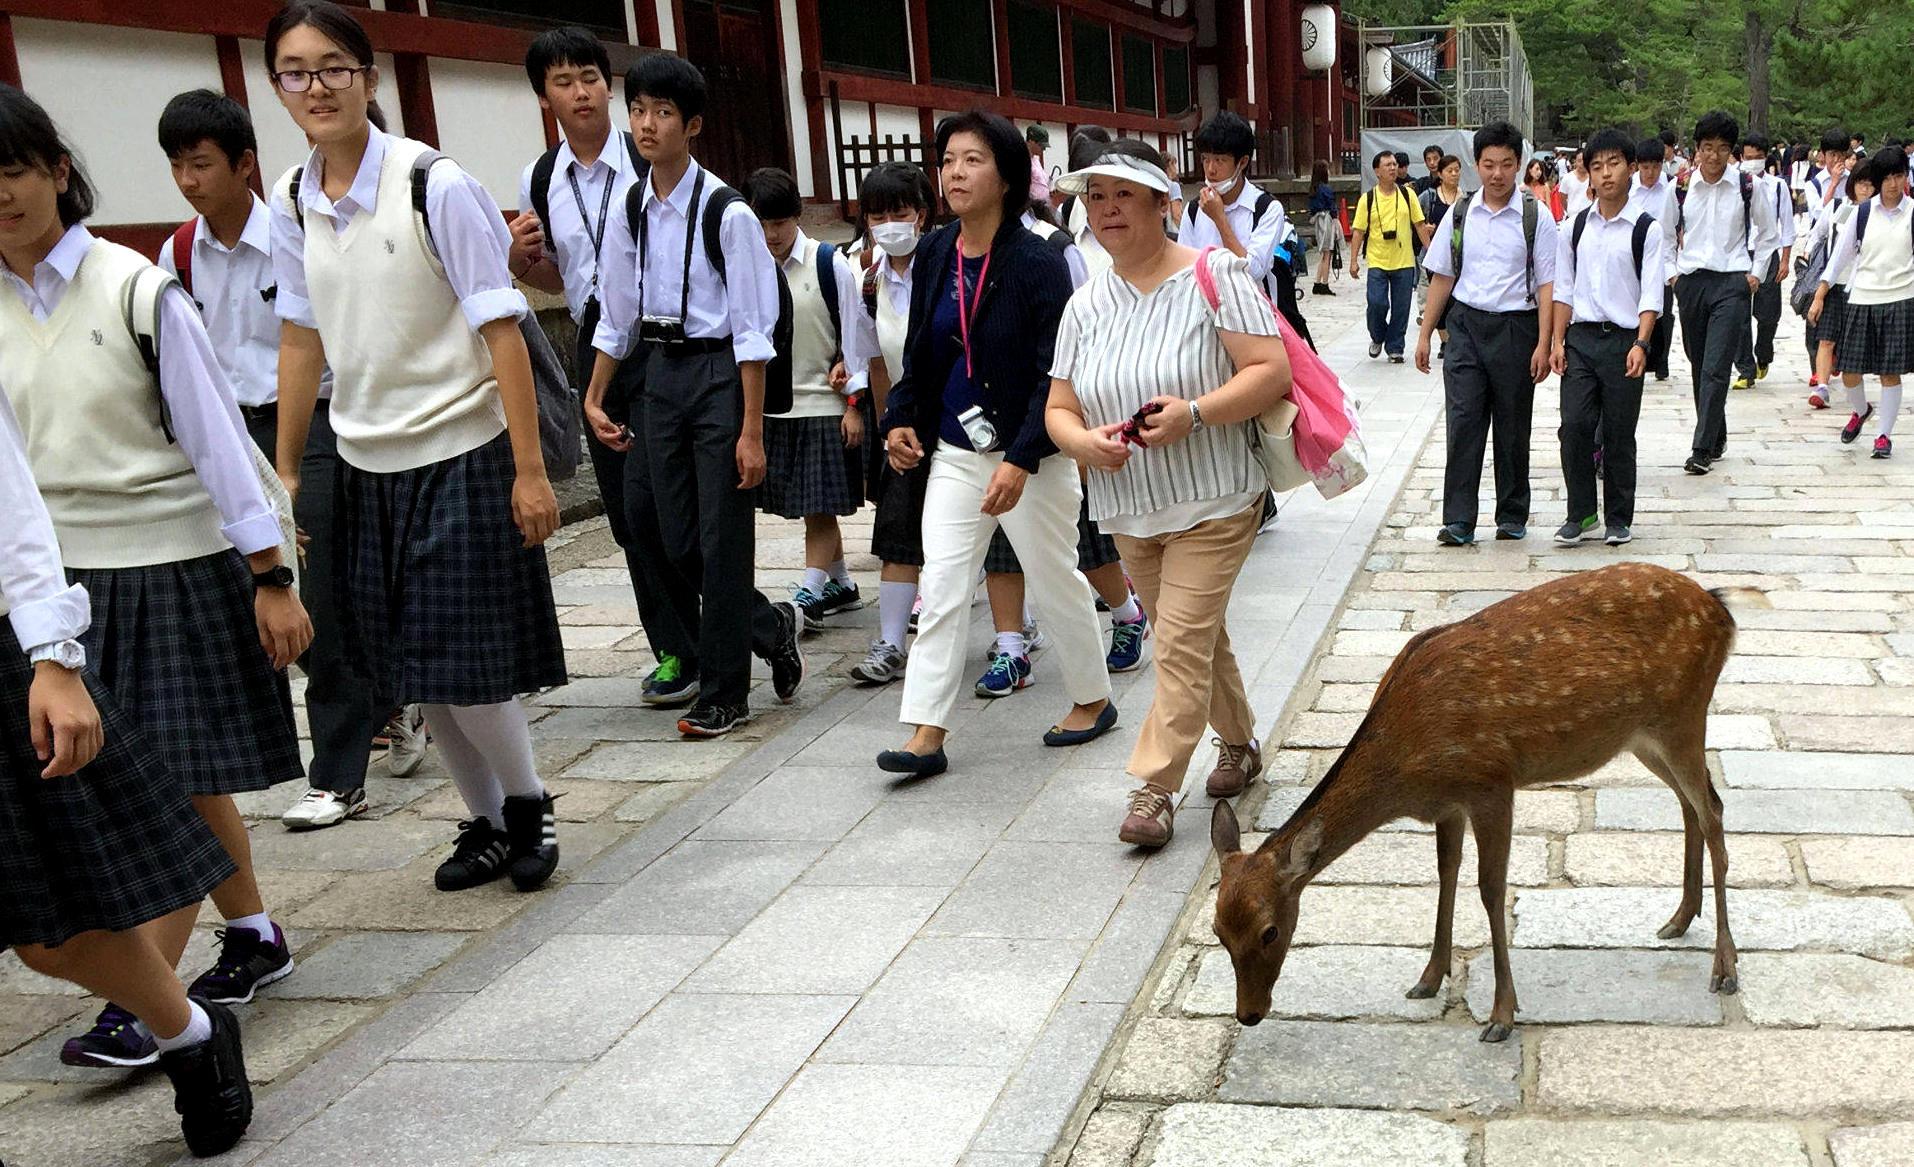 japonia nara daniel sarna mundurki iglawpodrozy